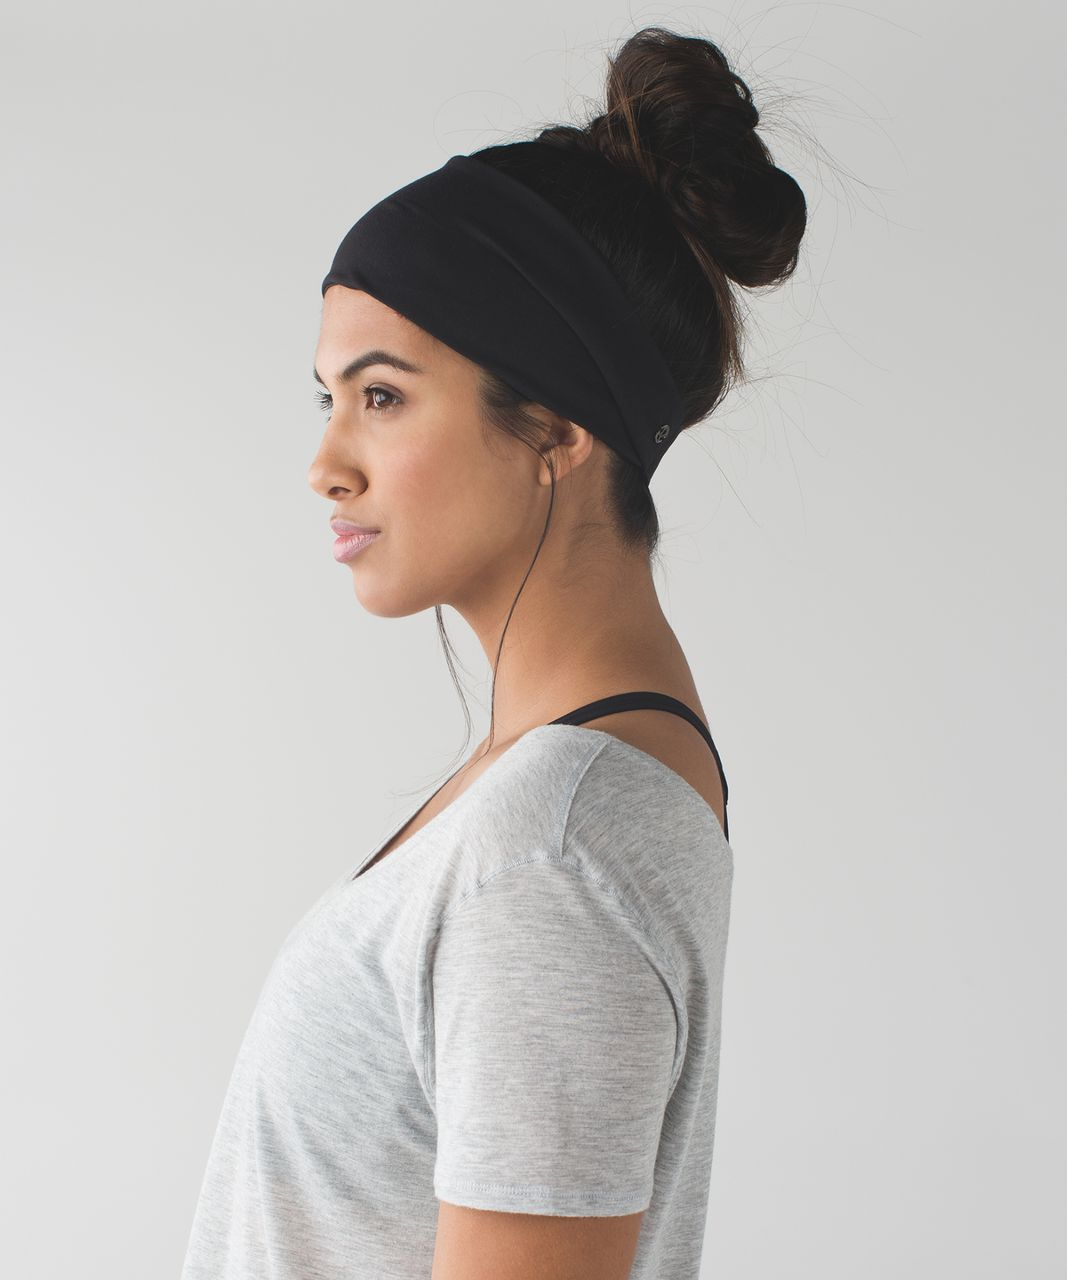 Lululemon Fringe Fighter Headband - Black